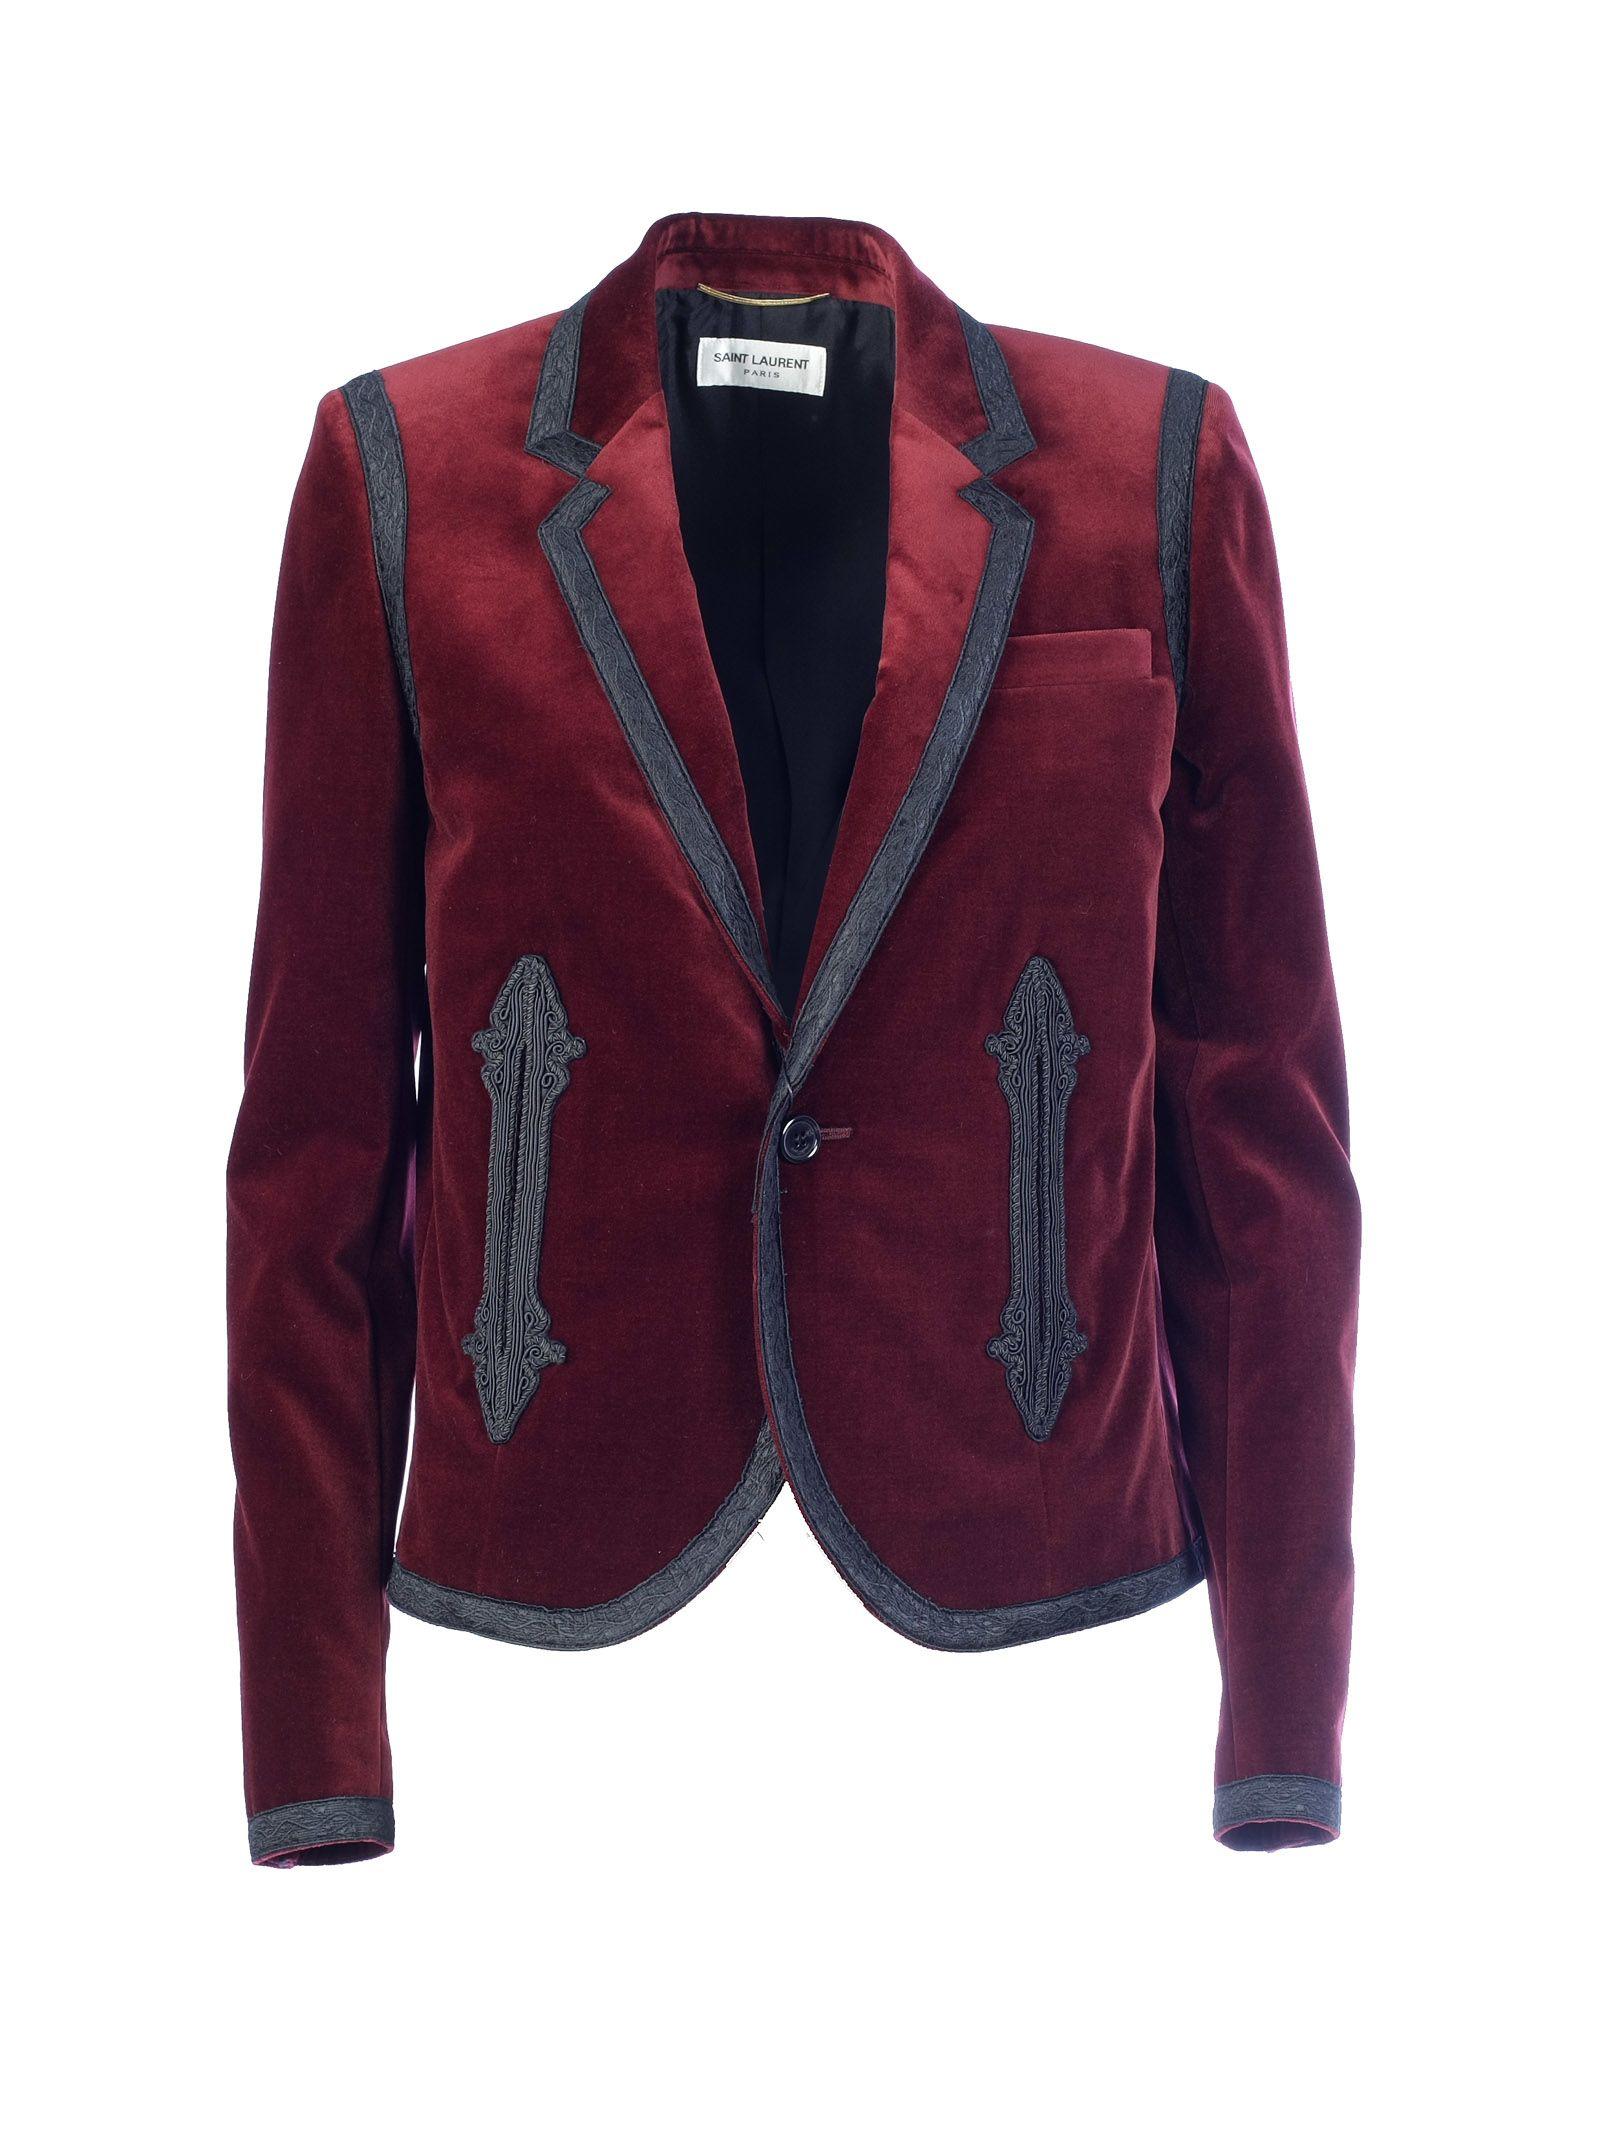 Saint Laurent Boxy Embroidered Blazer